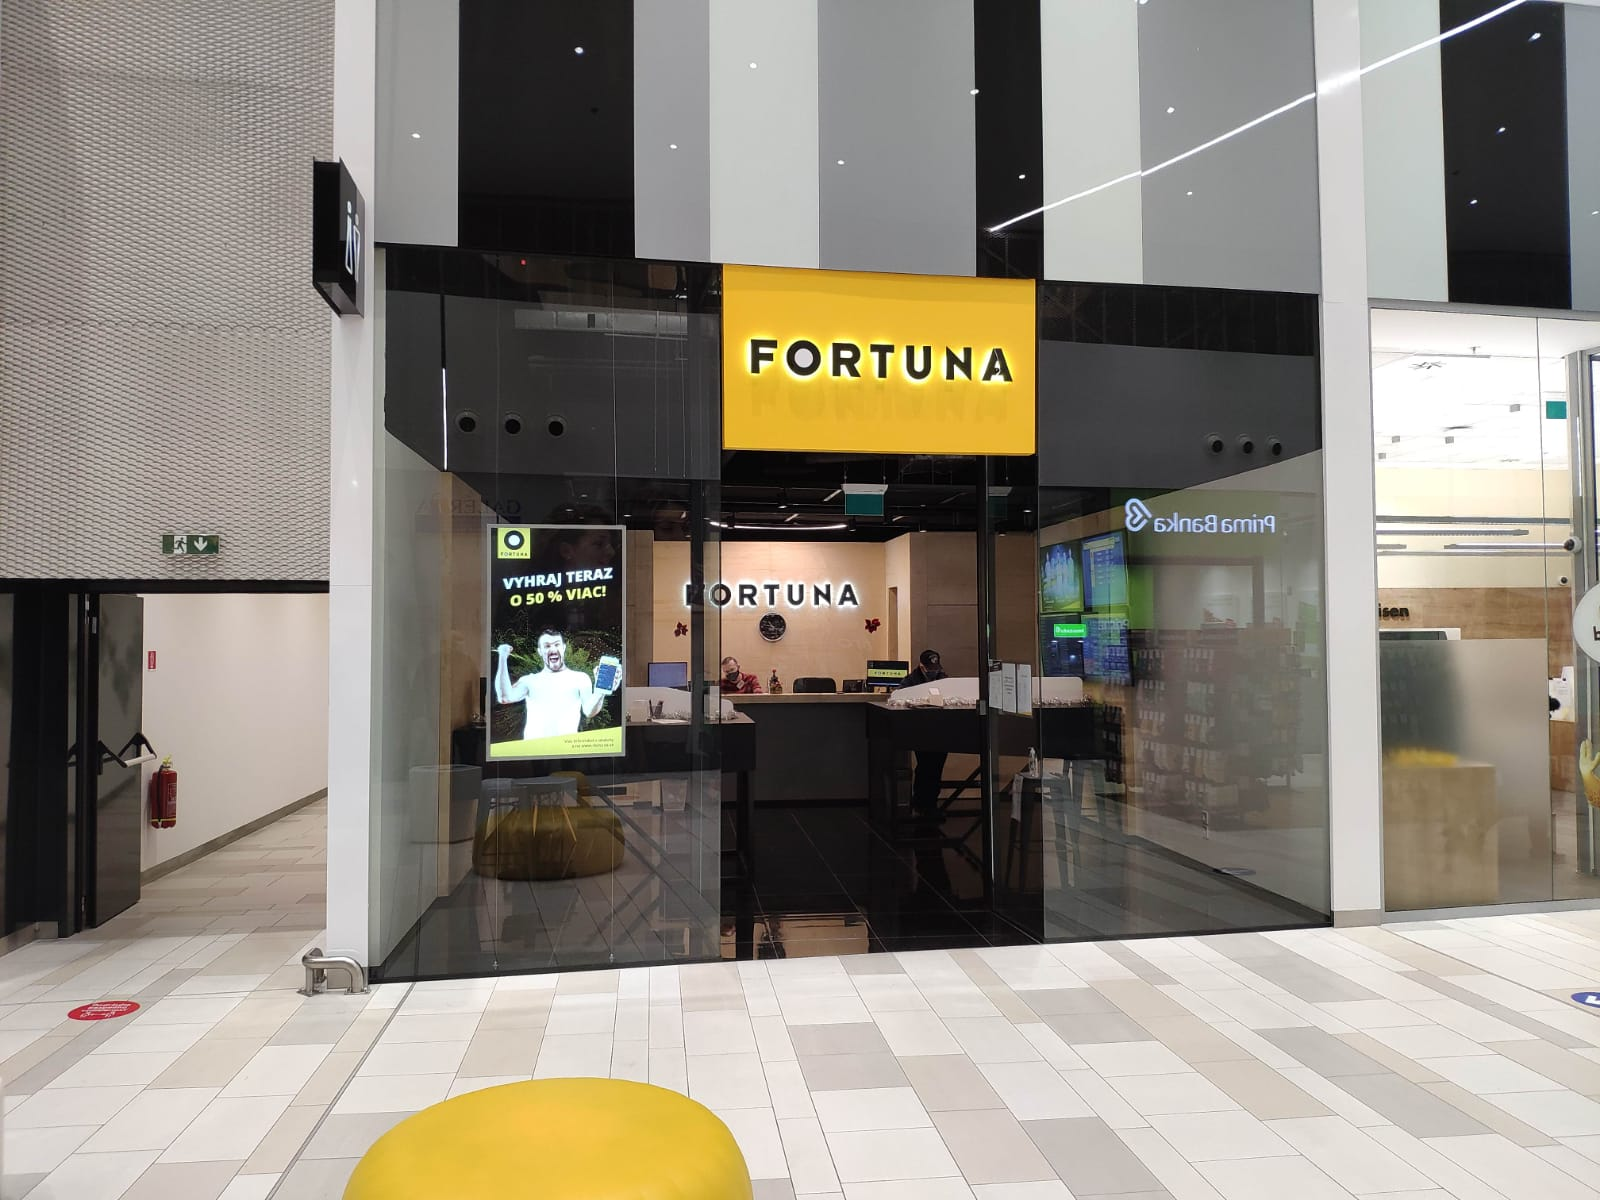 Fortuna3